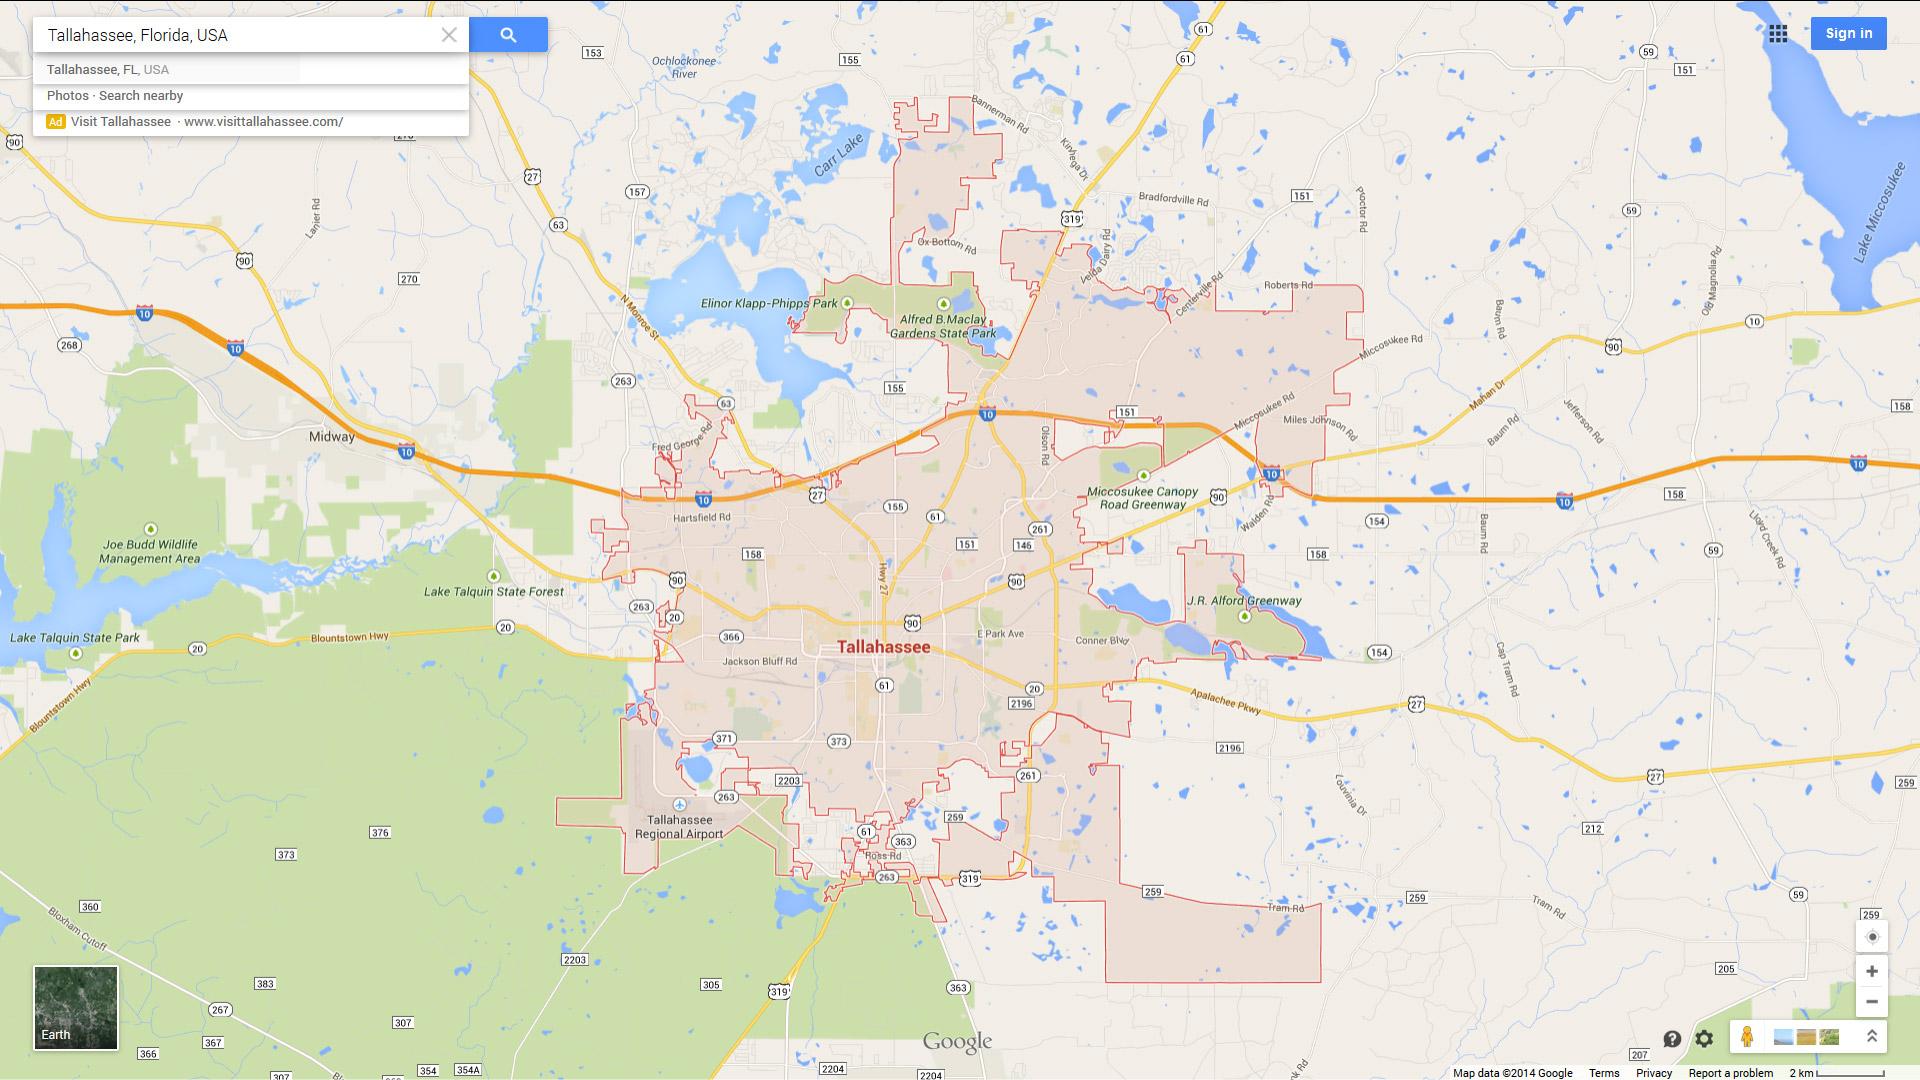 Tallahassee Florida Map.Tallahassee Florida Map